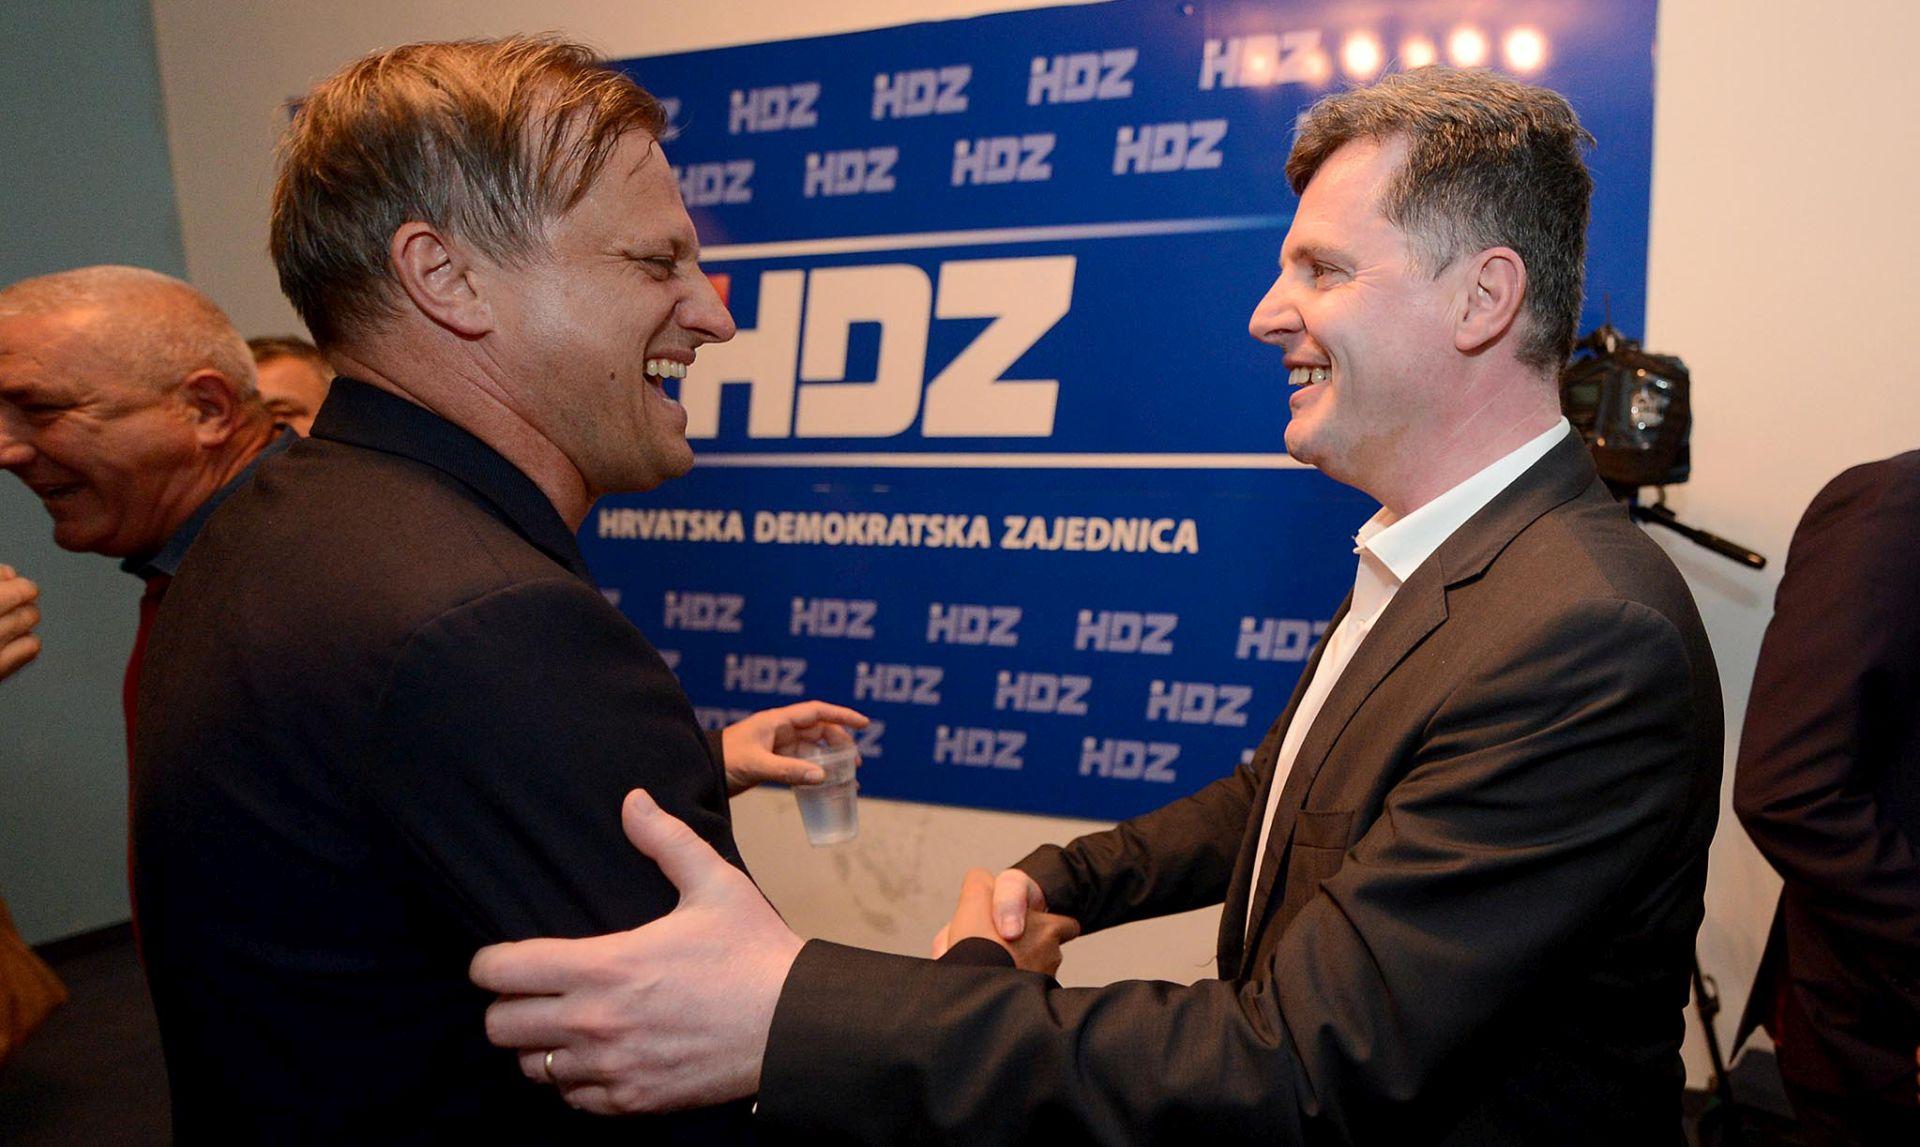 HDZ-ov Branko Dukić postao novi gradonačelnik Zadra